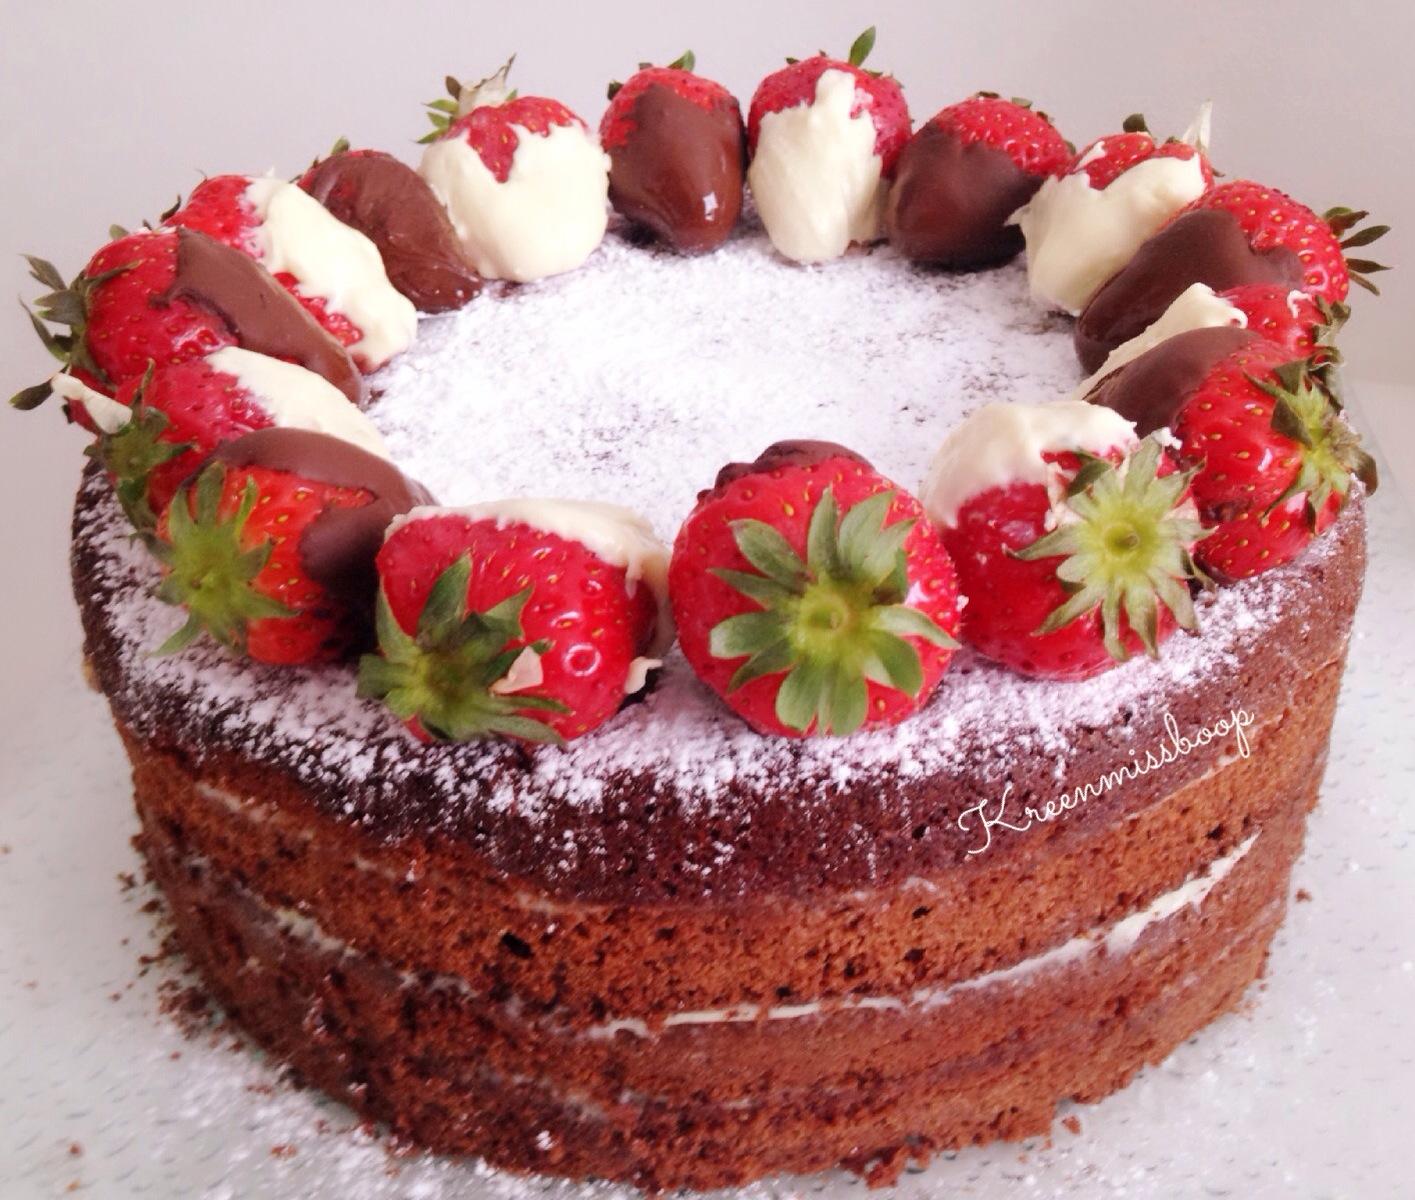 Recette Cake Design Fraise : Beauty Blog Plus Size : Cake Design / Naked Cake Choco ...